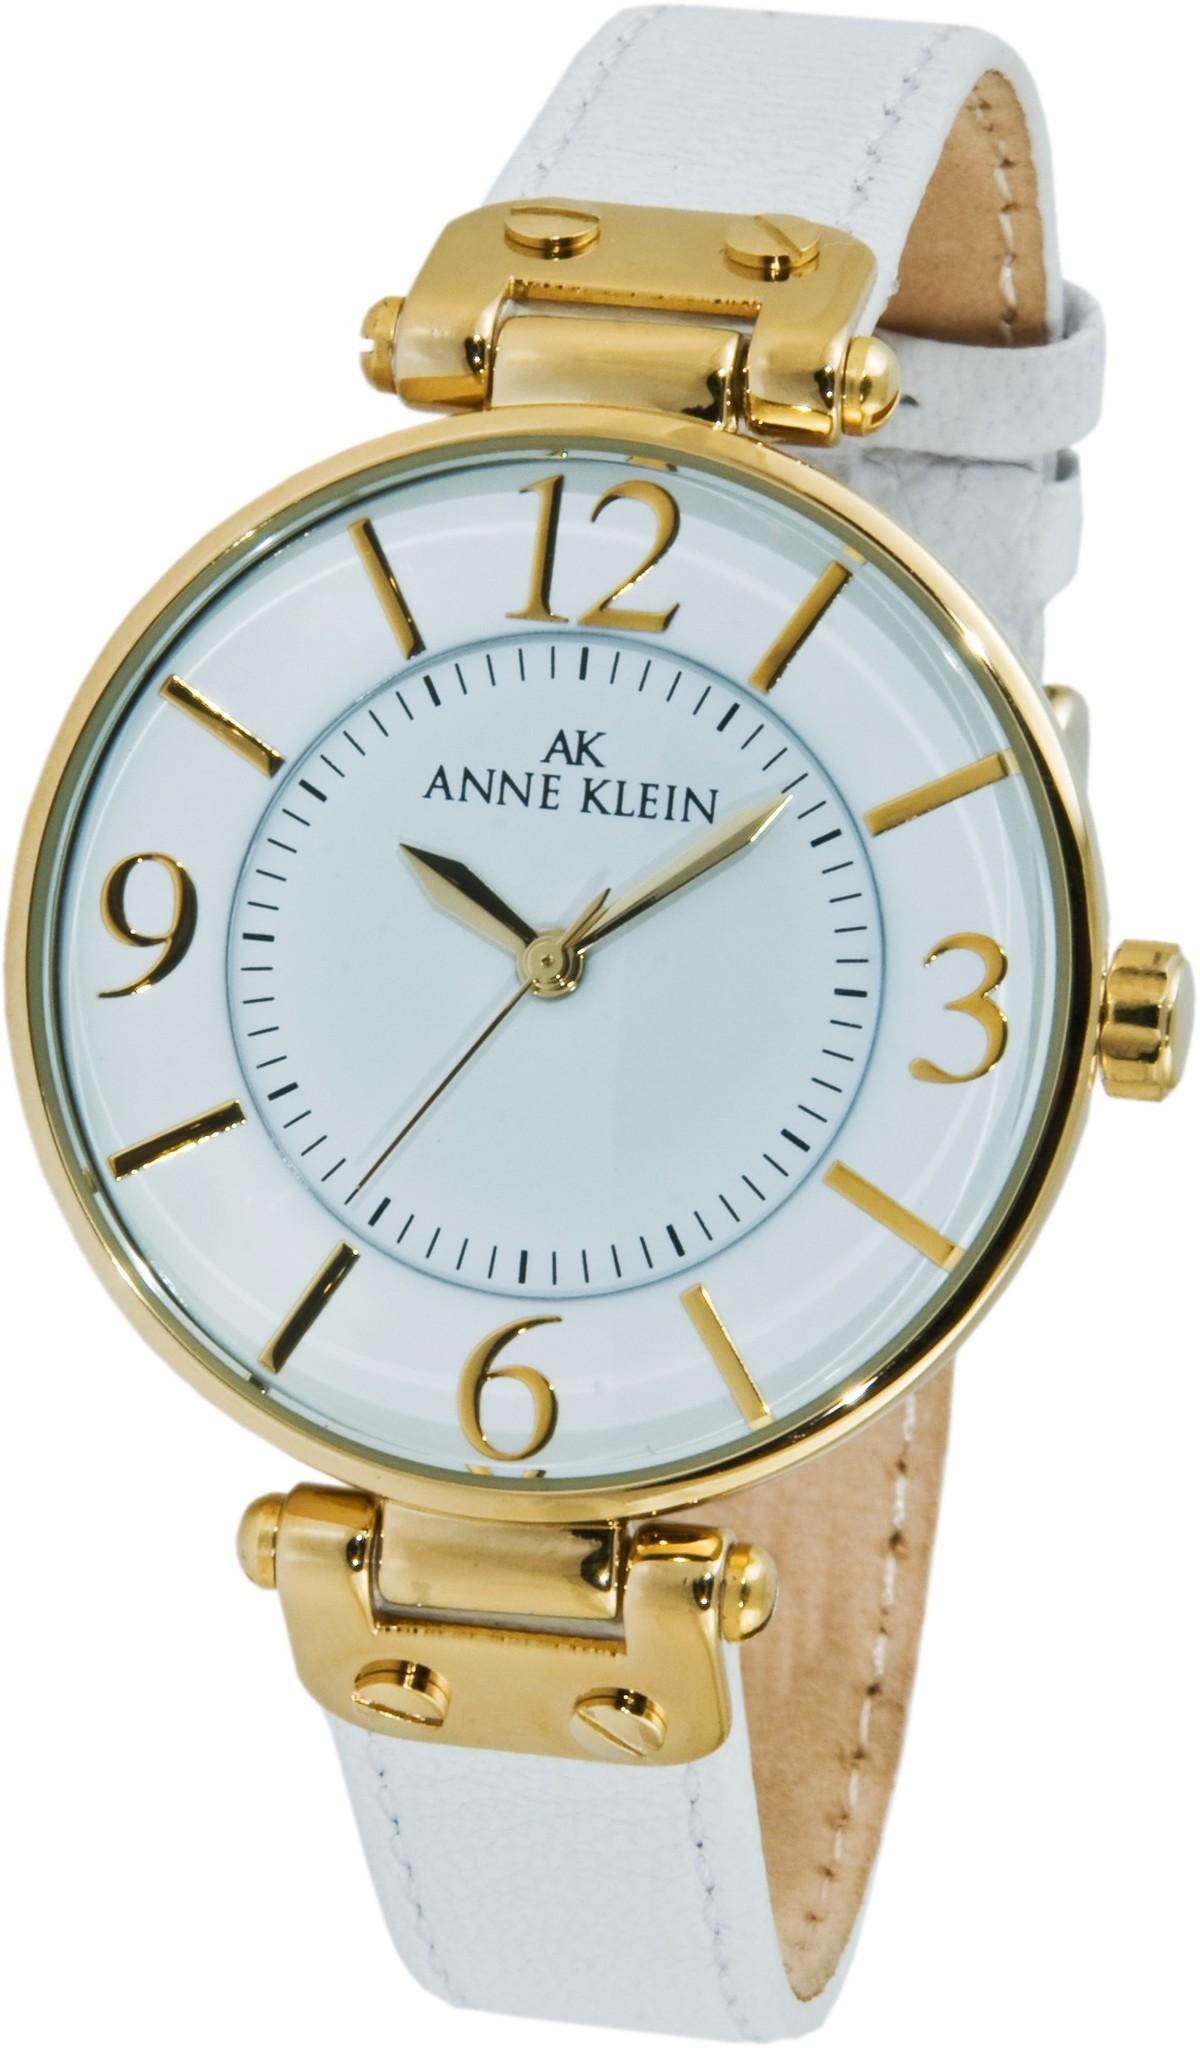 Anne Klein 9168WTWT - женские наручные часы из коллекции RingAnne Klein<br><br><br>Бренд: Anne Klein<br>Модель: Anne Klein 9168 WTWT<br>Артикул: 9168WTWT<br>Вариант артикула: None<br>Коллекция: Ring<br>Подколлекция: None<br>Страна: США<br>Пол: женские<br>Тип механизма: кварцевые<br>Механизм: None<br>Количество камней: None<br>Автоподзавод: None<br>Источник энергии: от батарейки<br>Срок службы элемента питания: None<br>Дисплей: стрелки<br>Цифры: арабские<br>Водозащита: None<br>Противоударные: None<br>Материал корпуса: нерж. сталь<br>Материал браслета: кожа<br>Материал безеля: None<br>Стекло: минеральное<br>Антибликовое покрытие: None<br>Цвет корпуса: None<br>Цвет браслета: None<br>Цвет циферблата: None<br>Цвет безеля: None<br>Размеры: None<br>Диаметр: None<br>Диаметр корпуса: None<br>Толщина: None<br>Ширина ремешка: None<br>Вес: None<br>Спорт-функции: None<br>Подсветка: None<br>Вставка: None<br>Отображение даты: None<br>Хронограф: None<br>Таймер: None<br>Термометр: None<br>Хронометр: None<br>GPS: None<br>Радиосинхронизация: None<br>Барометр: None<br>Скелетон: None<br>Дополнительная информация: None<br>Дополнительные функции: None